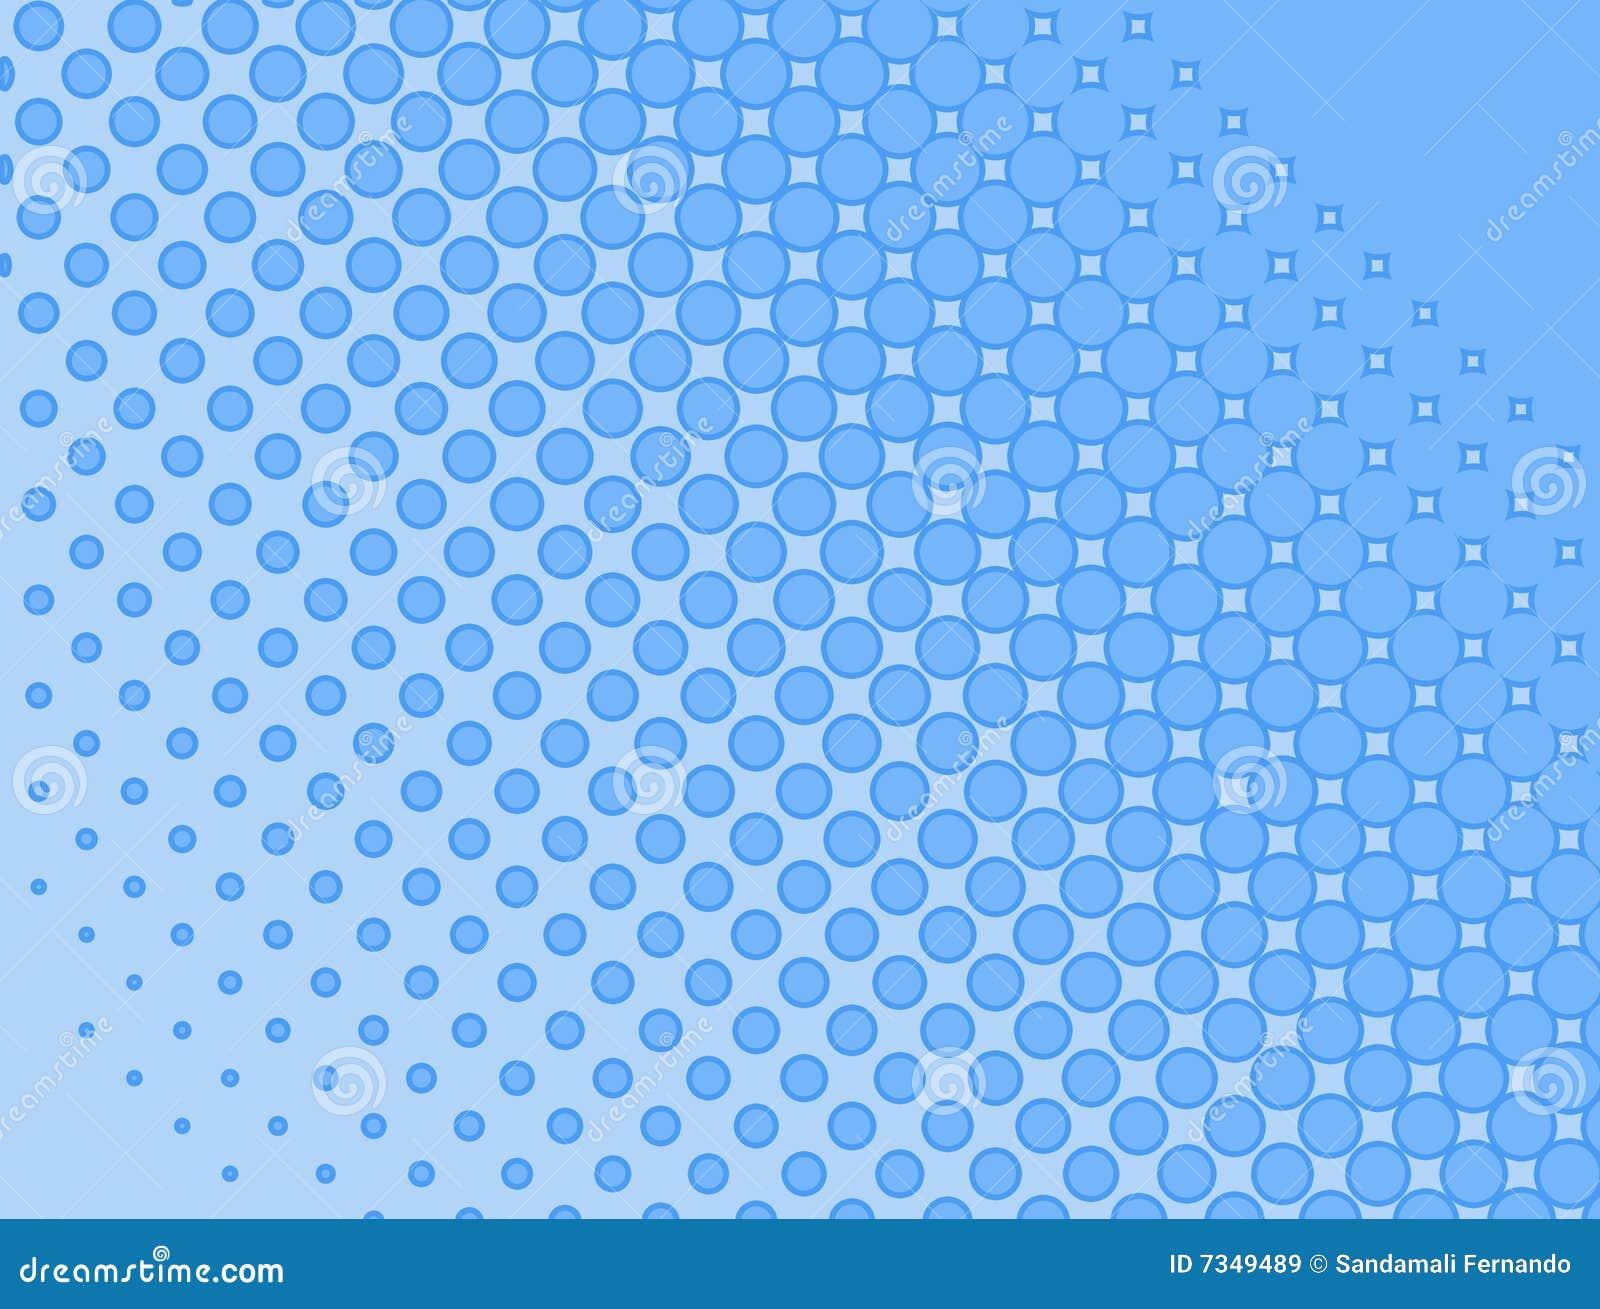 Cute Light Blue Wallpapers Halftone